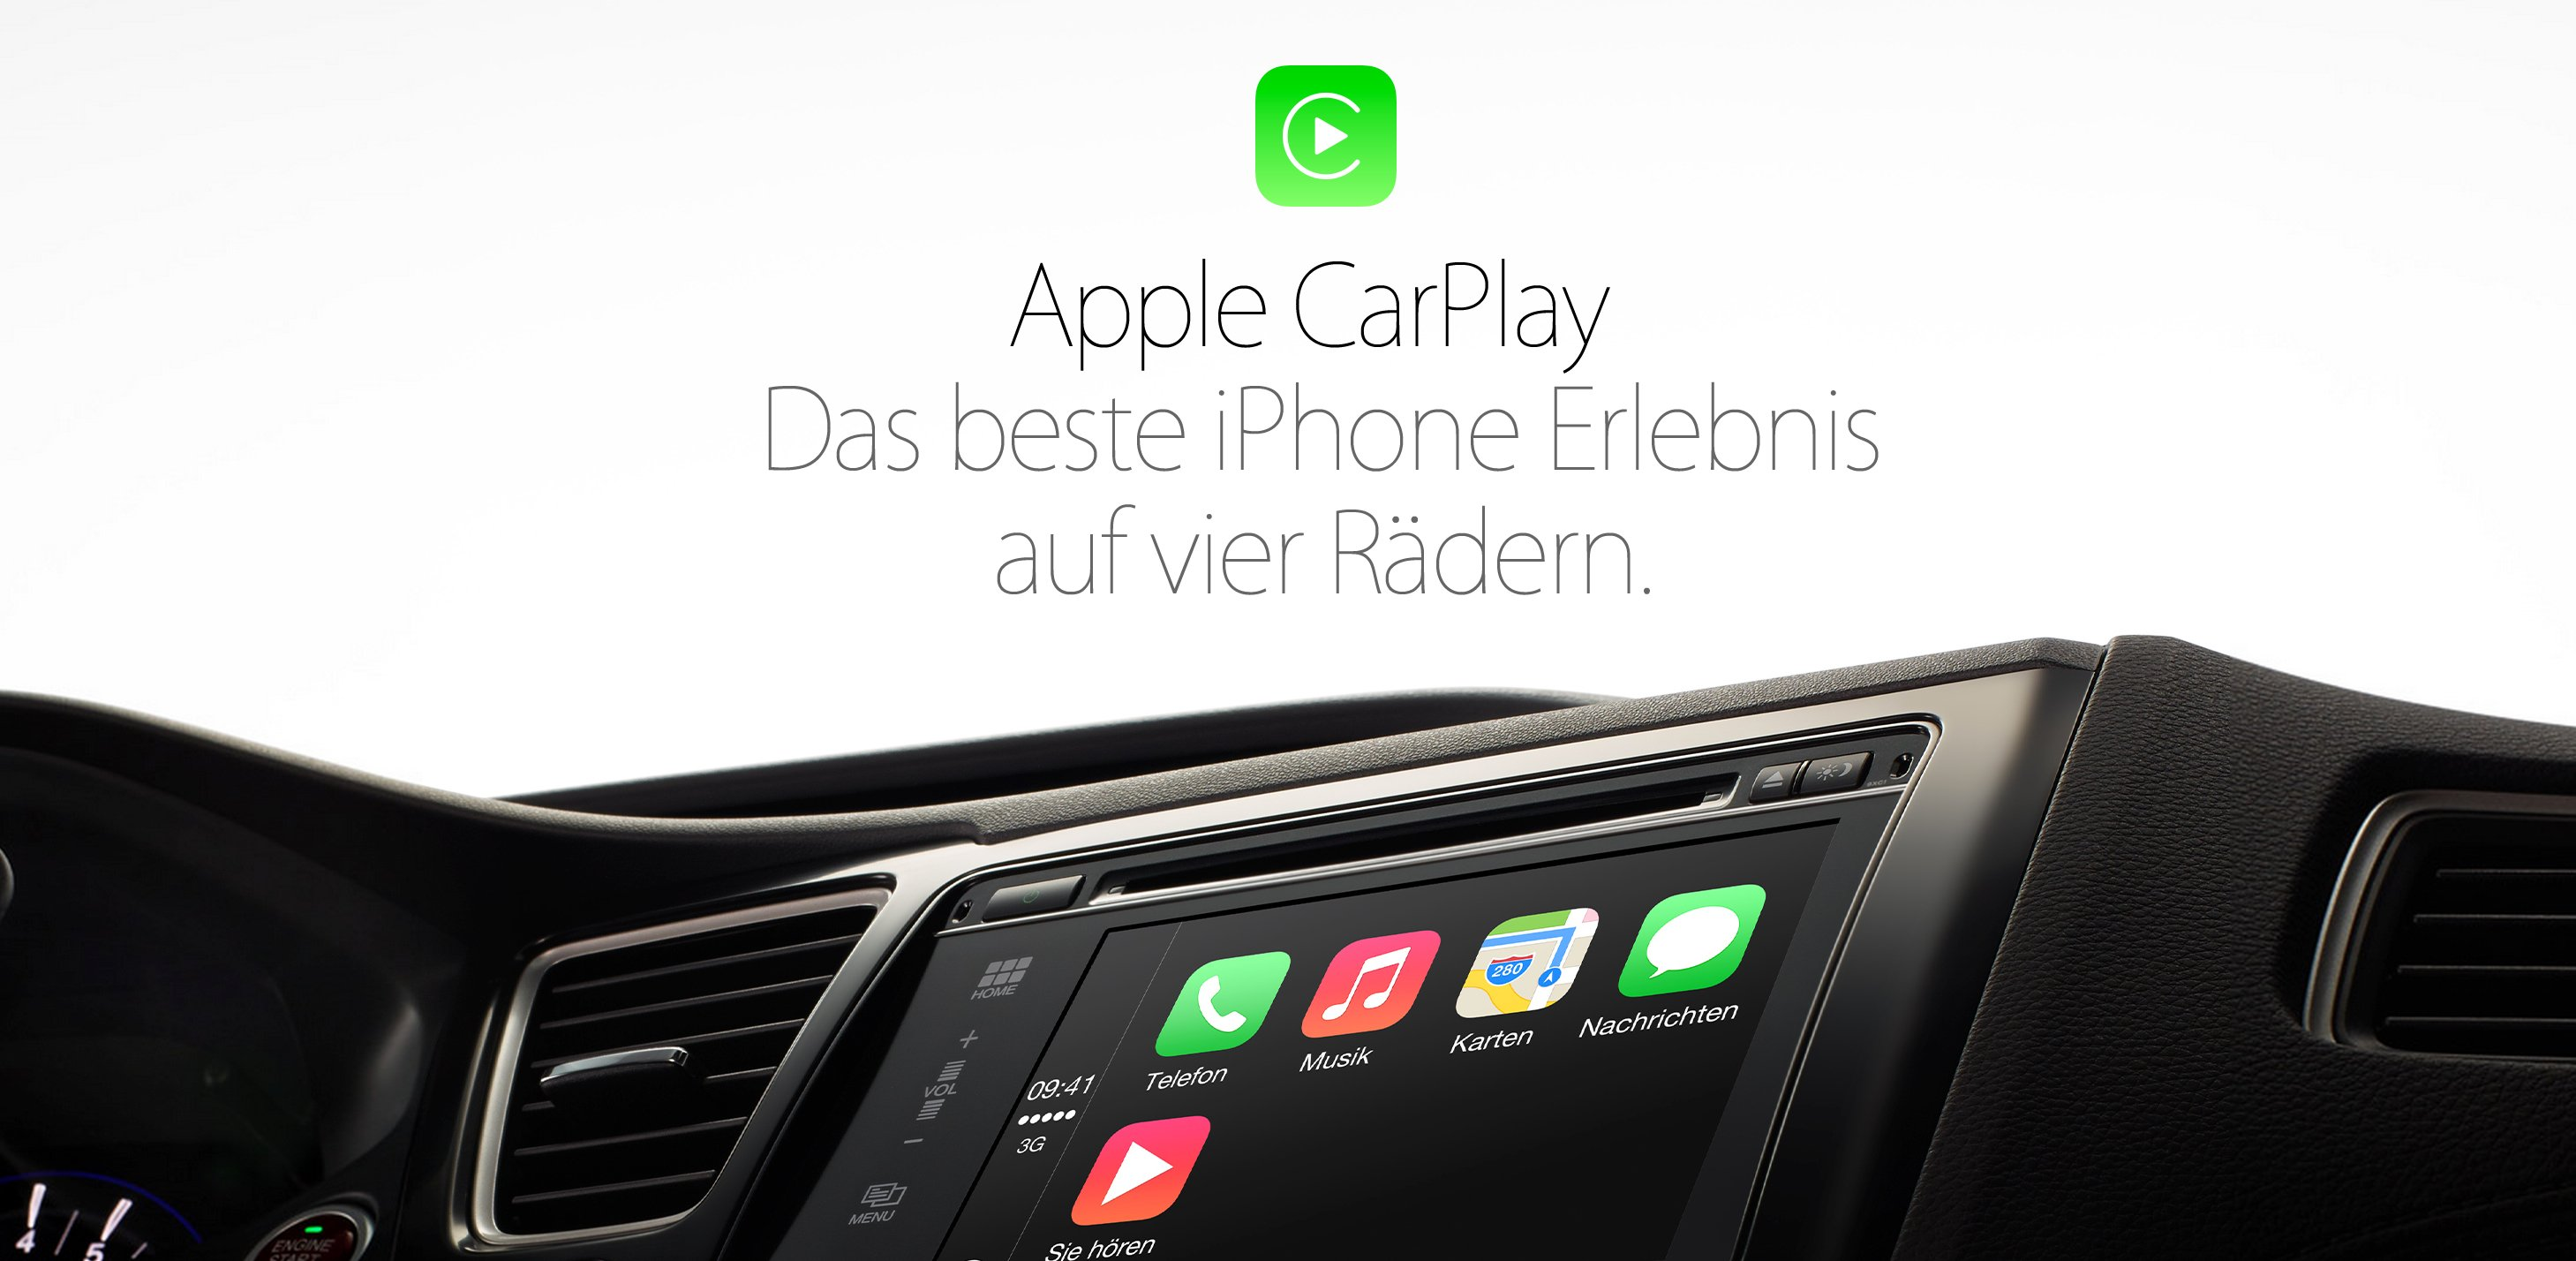 Apple CarPlay mit Audi, BMW, Mercedes-Benz aber ohne VW? 6